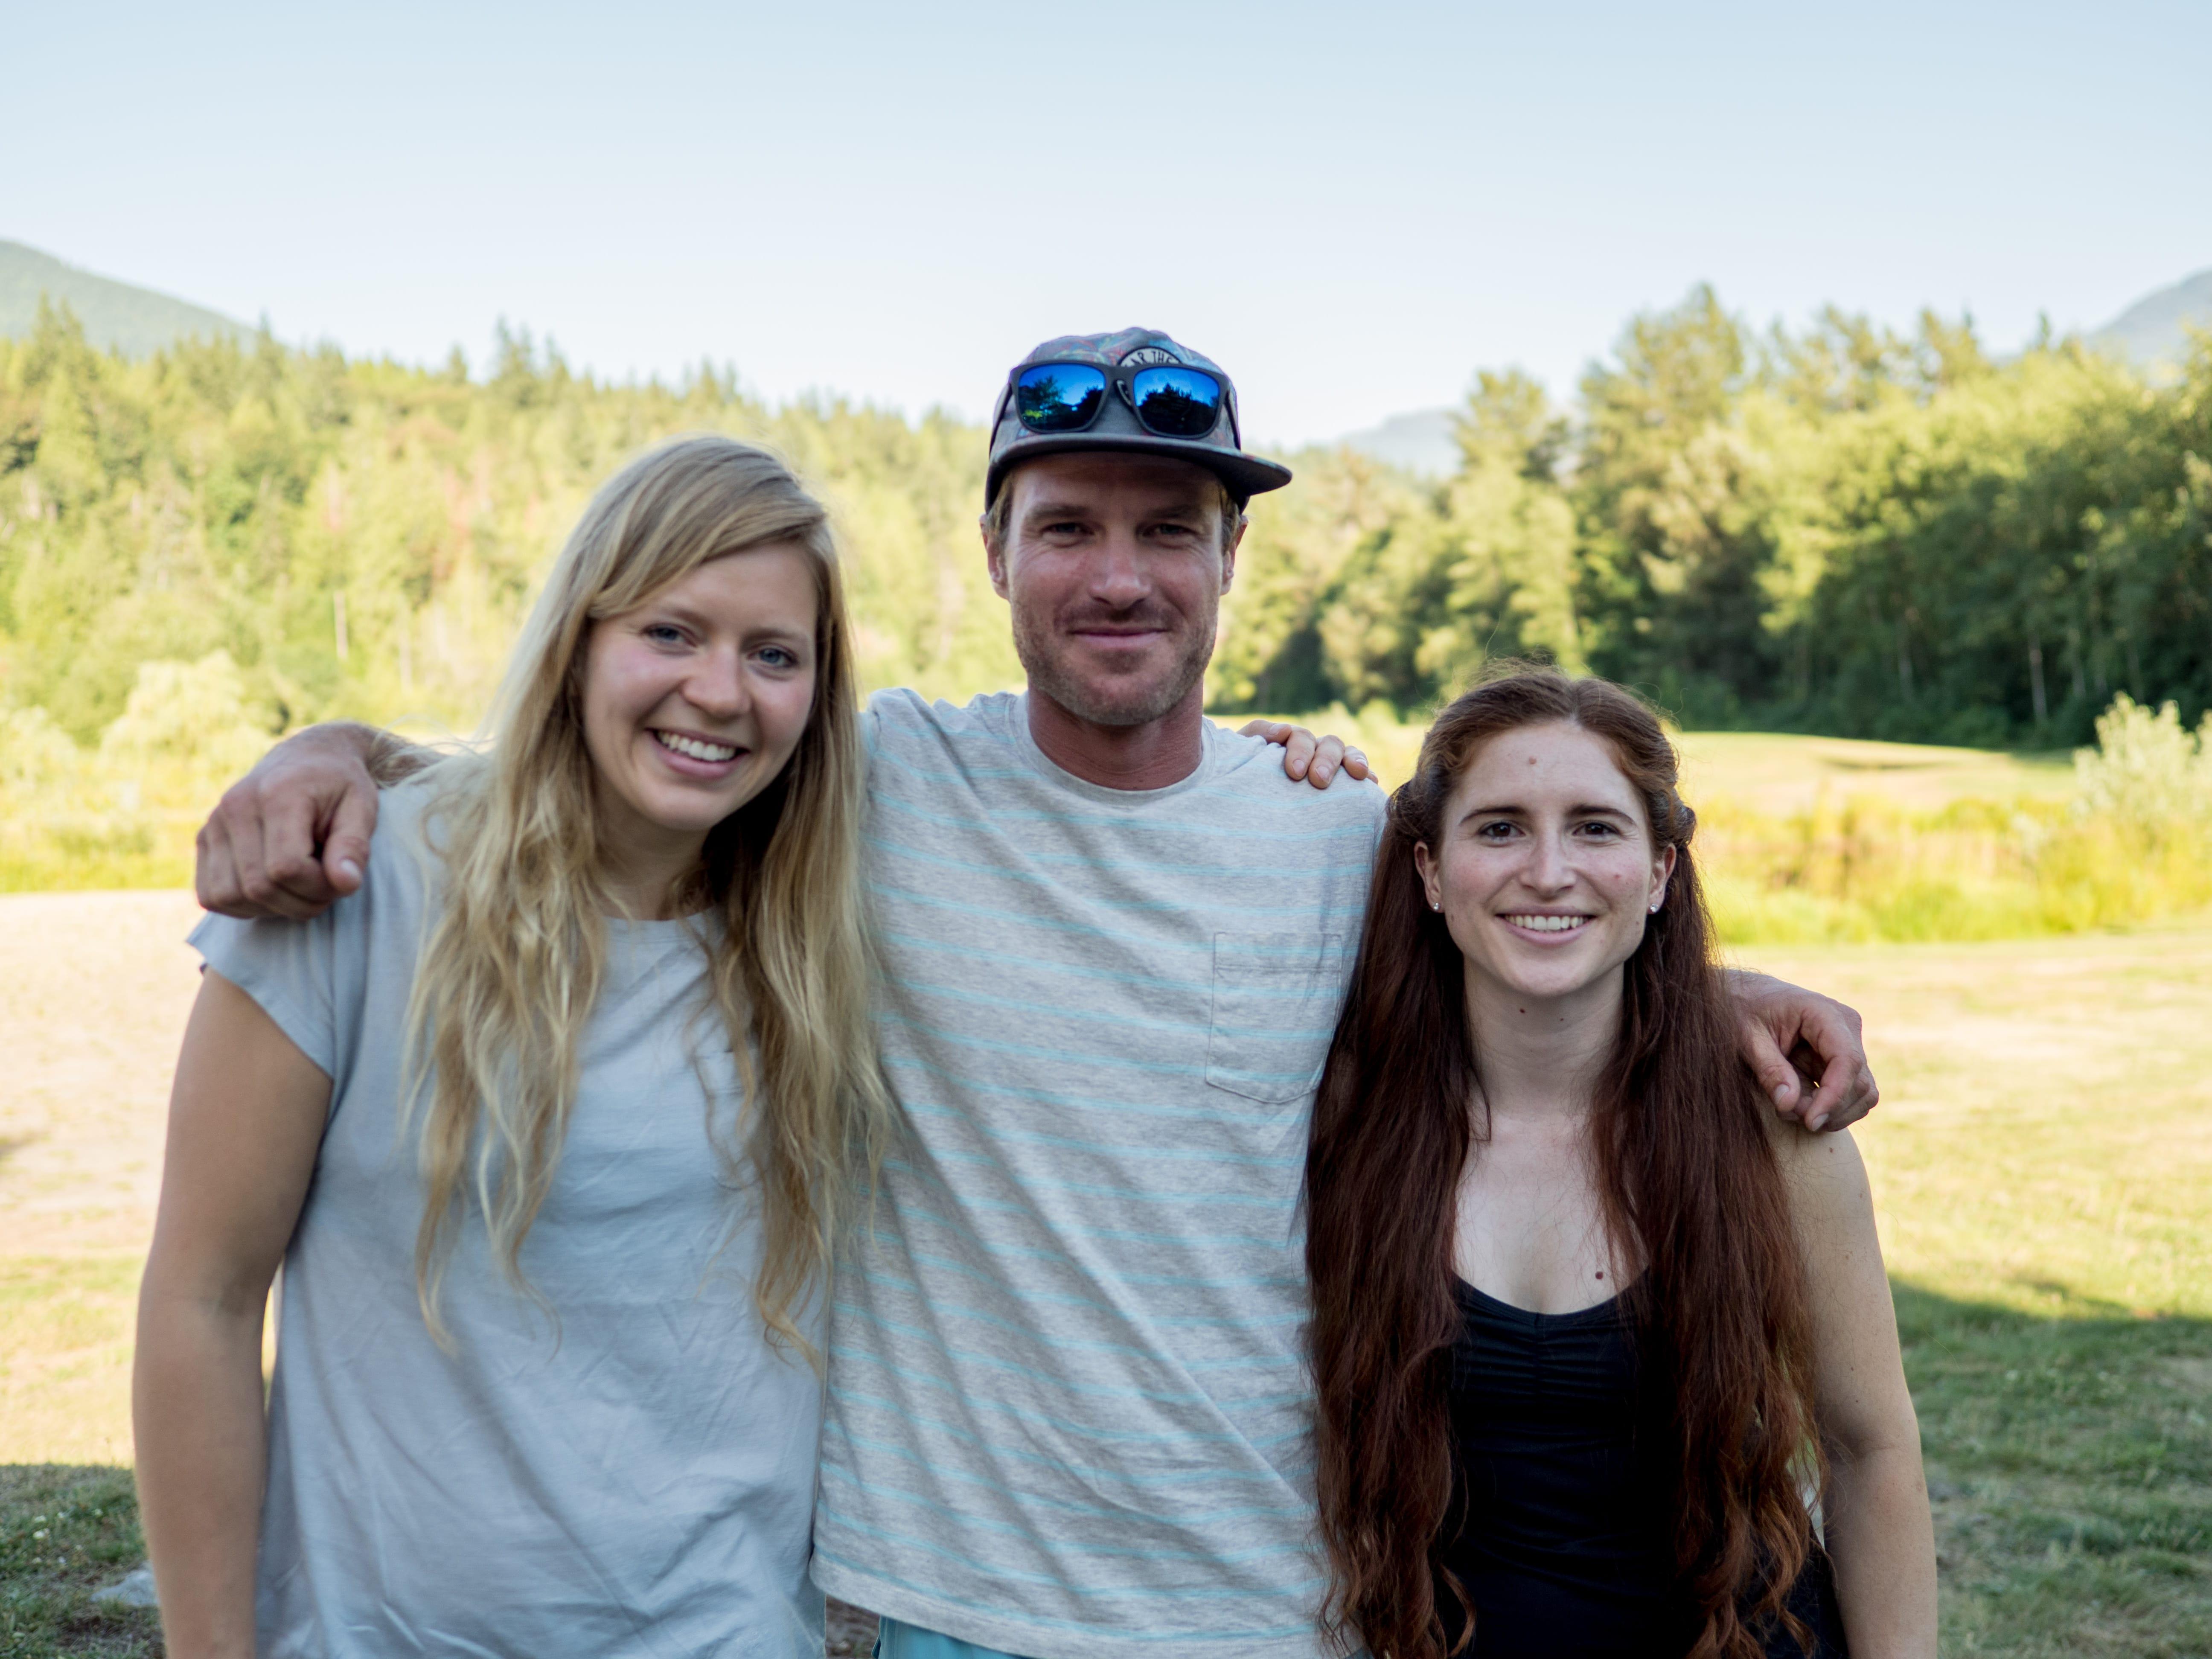 Mina Leslie-Wujastyk, Drew Smith, Caitlin McNulty